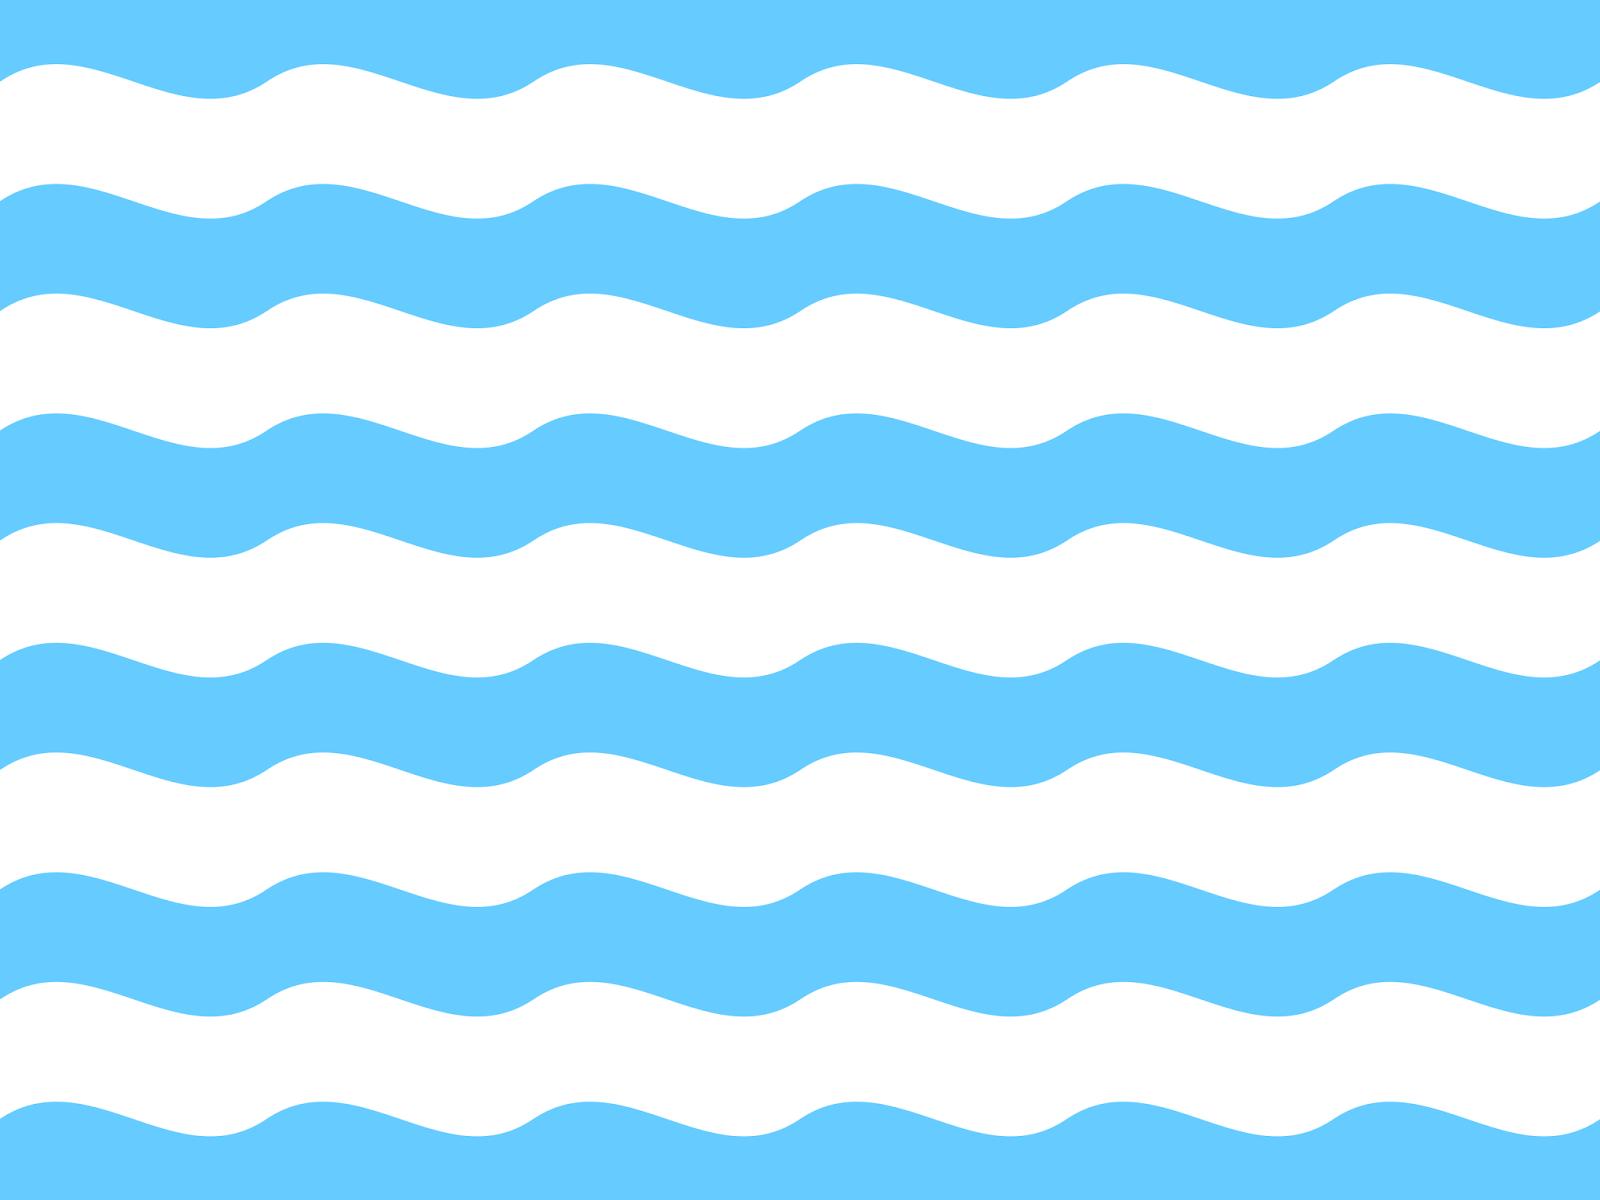 Ocean Waves Border - Clipart library-Ocean Waves Border - Clipart library-13